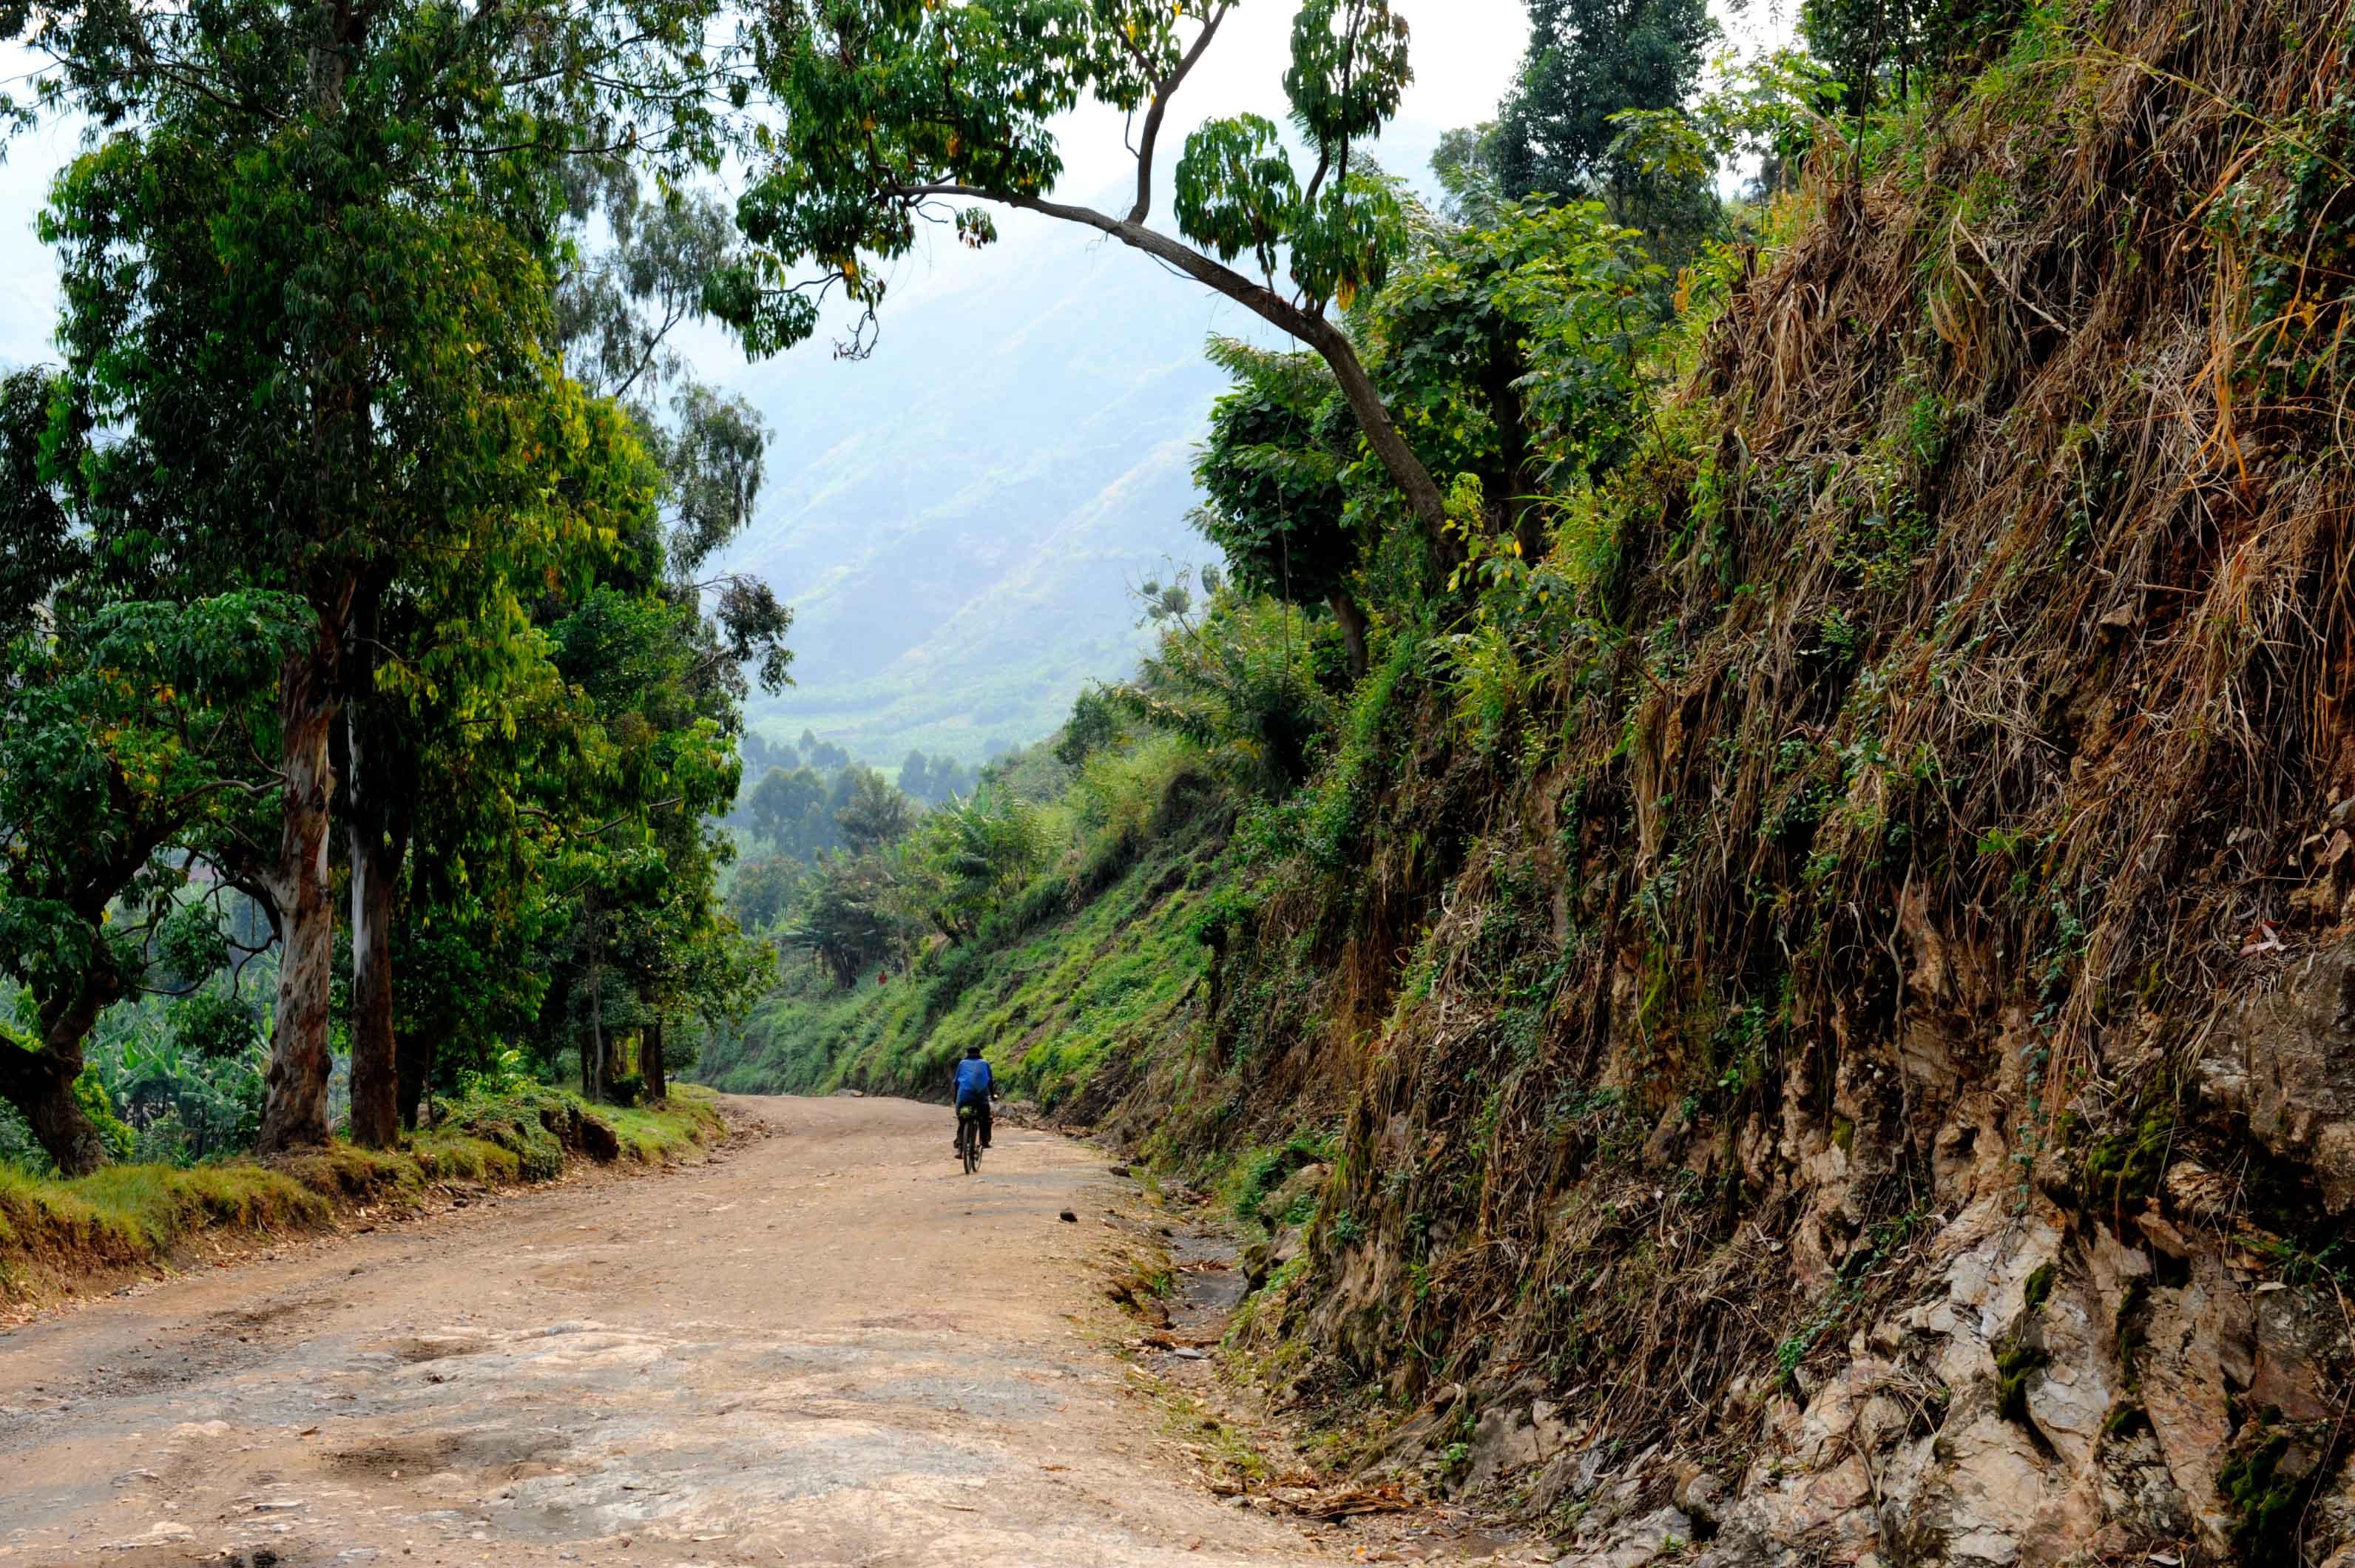 The road to Minova